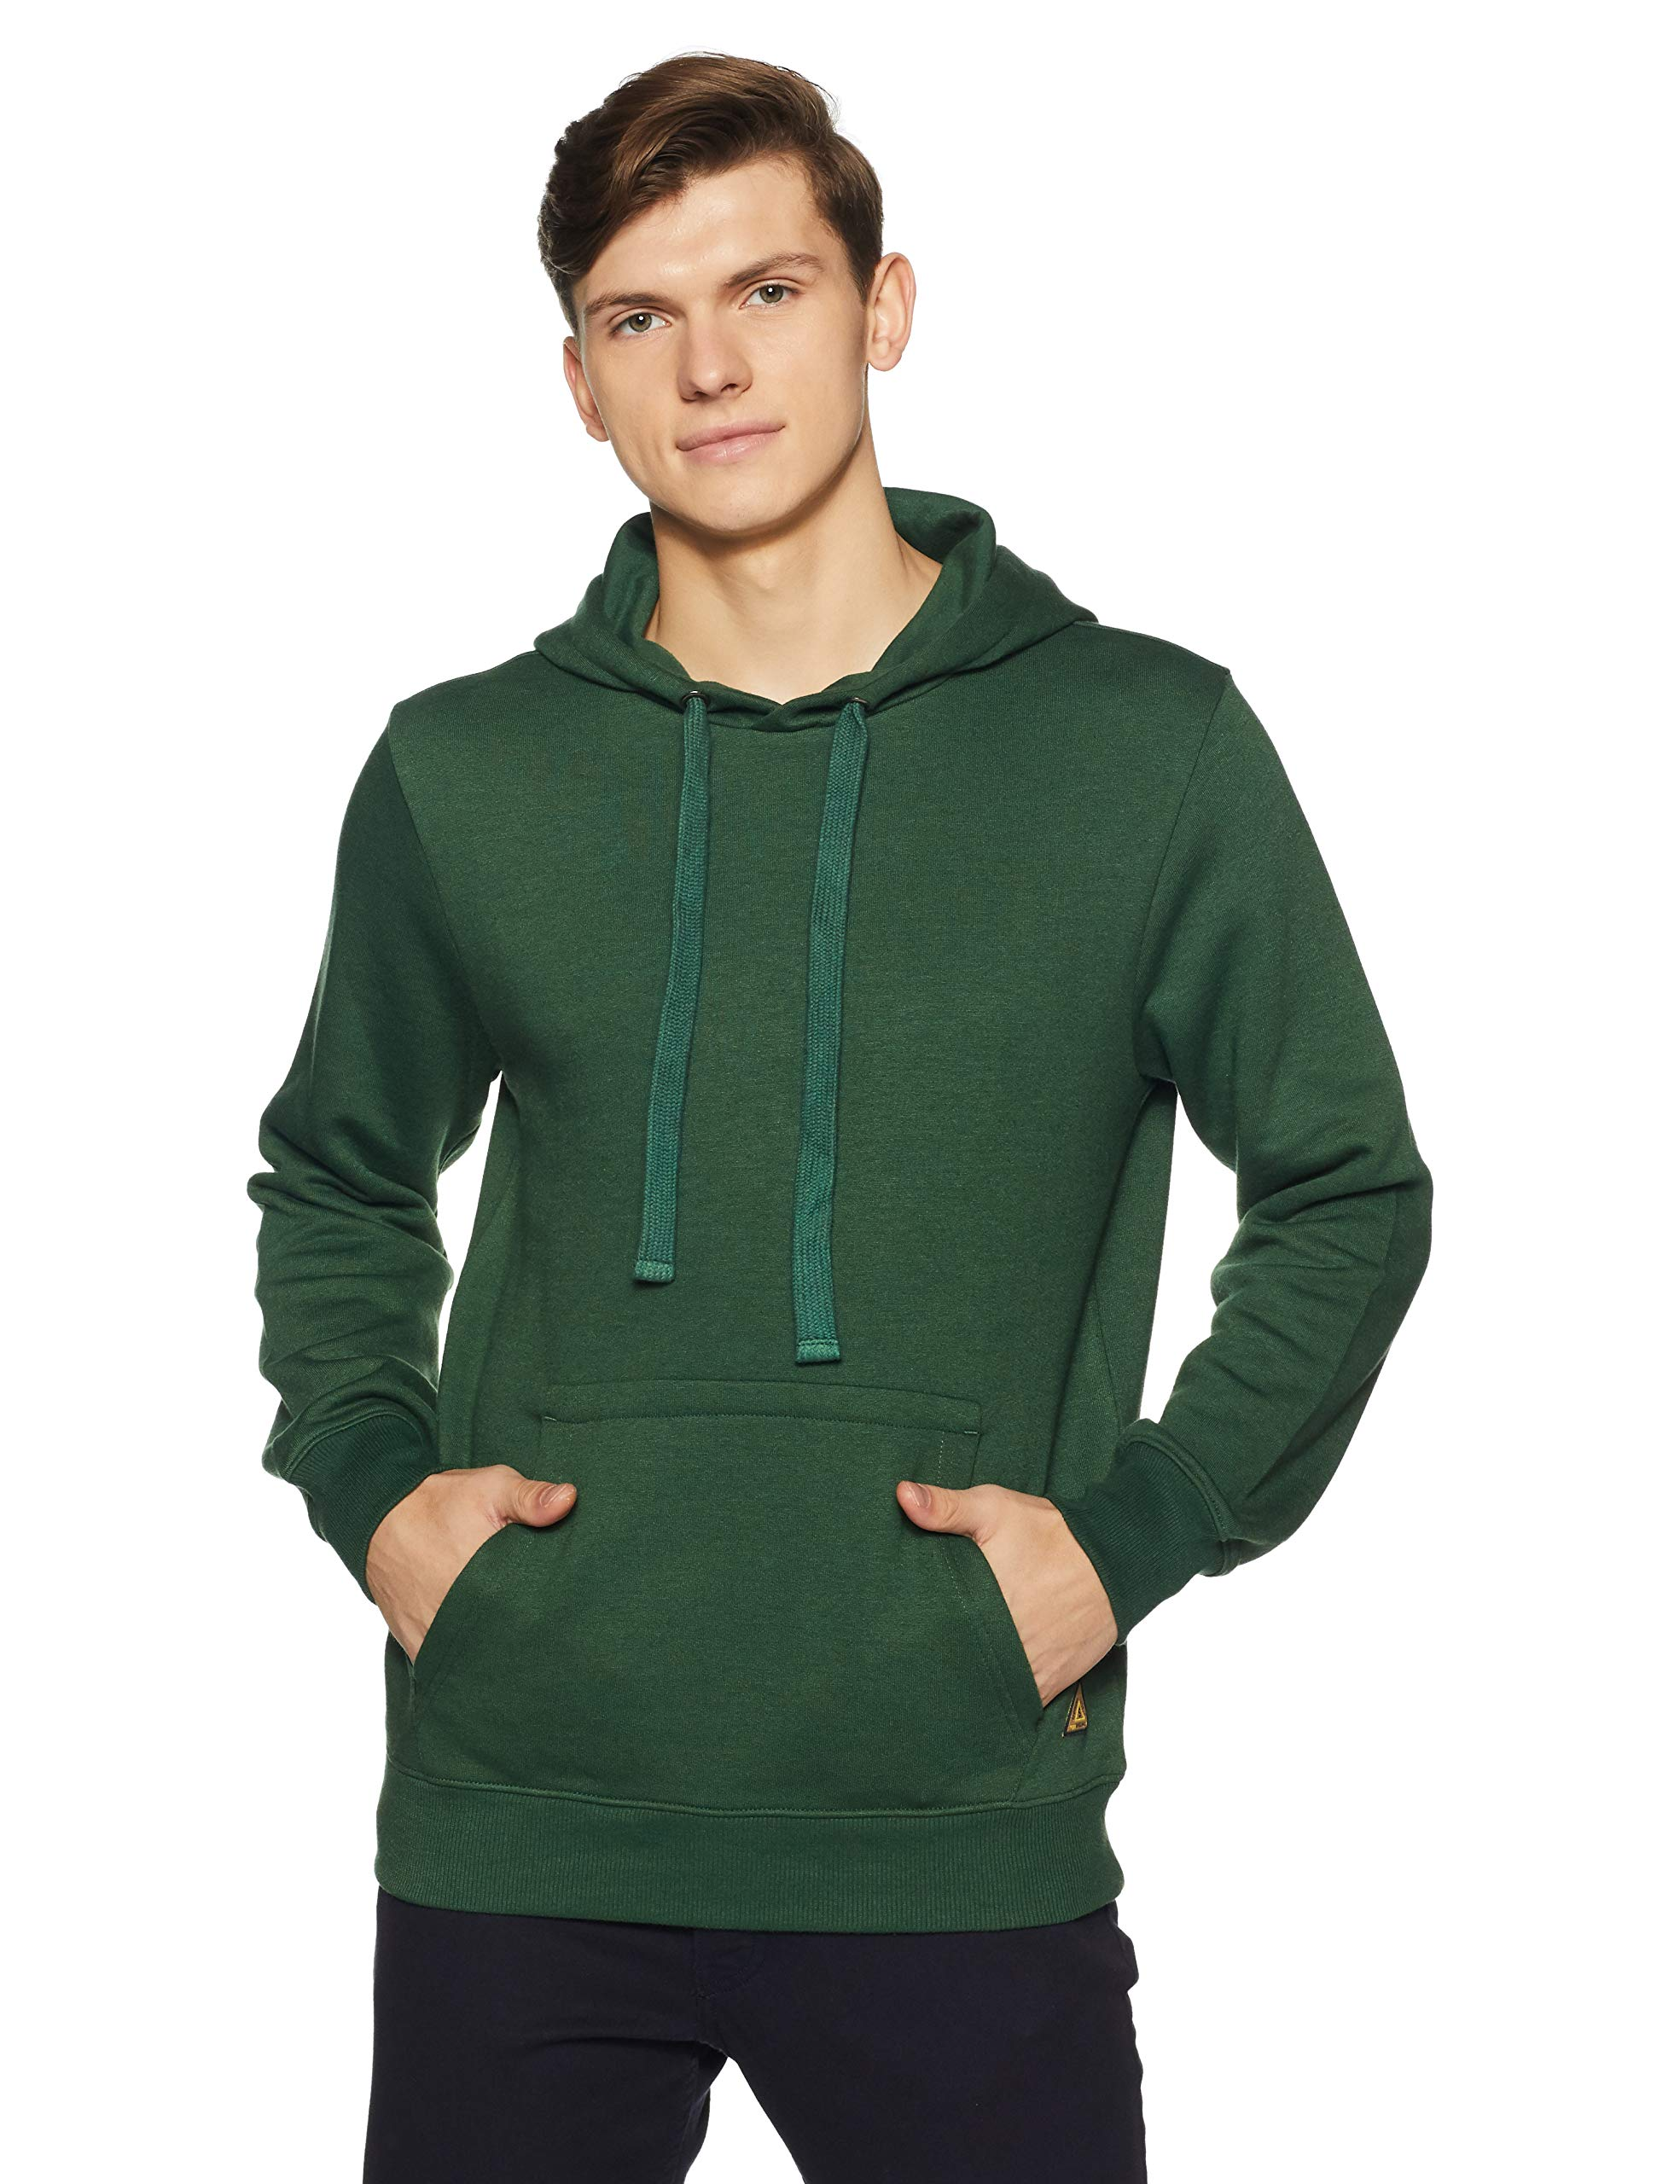 Amazon Brand - Symbol Men's Sweatshirt (AW18MNSSW02F_Post Green_Medium) (B07DNW2CWY) Amazon Price History, Amazon Price Tracker